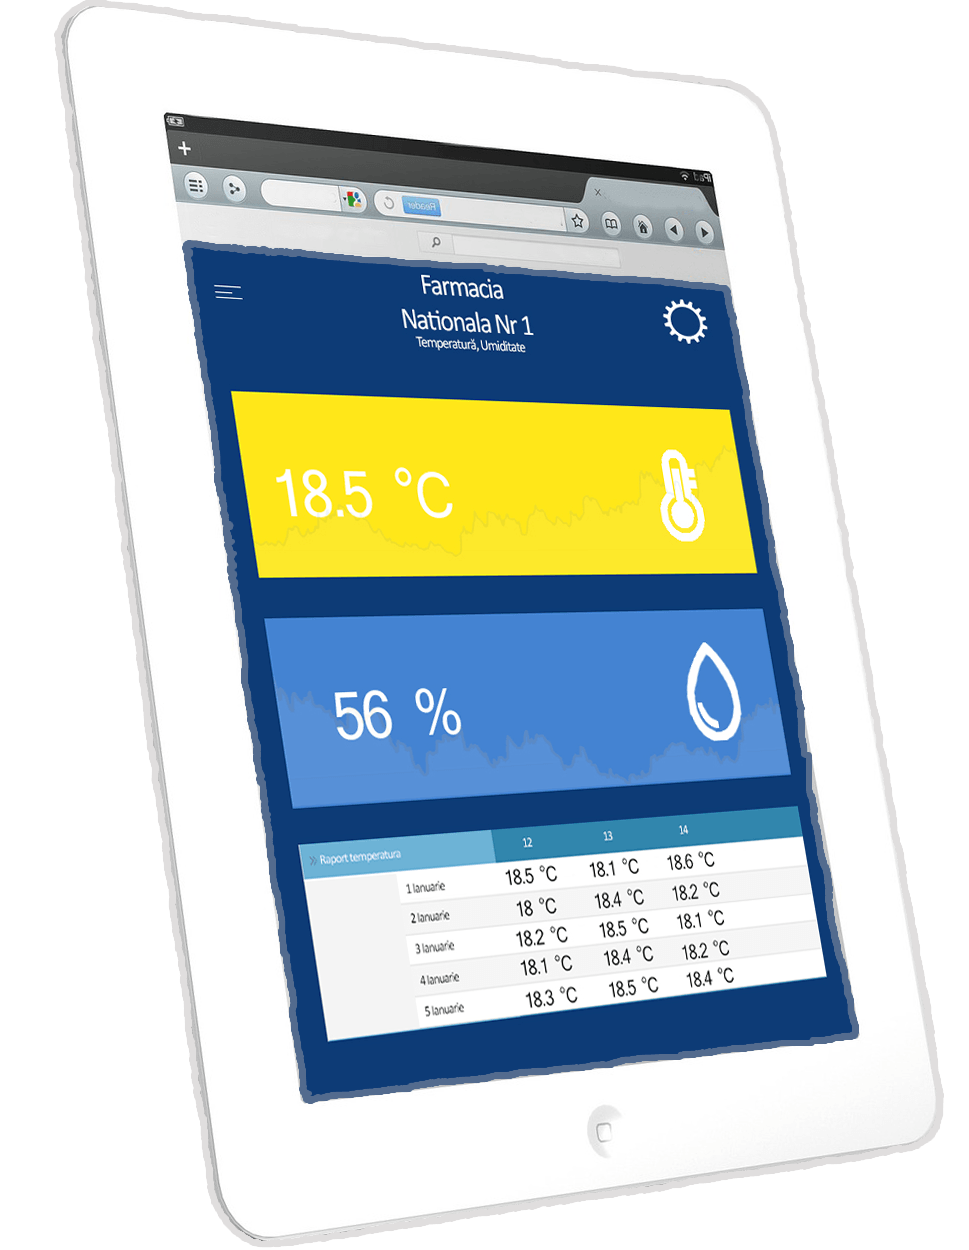 Monitorizare lant de frig BlueMonitor SMART Pharma